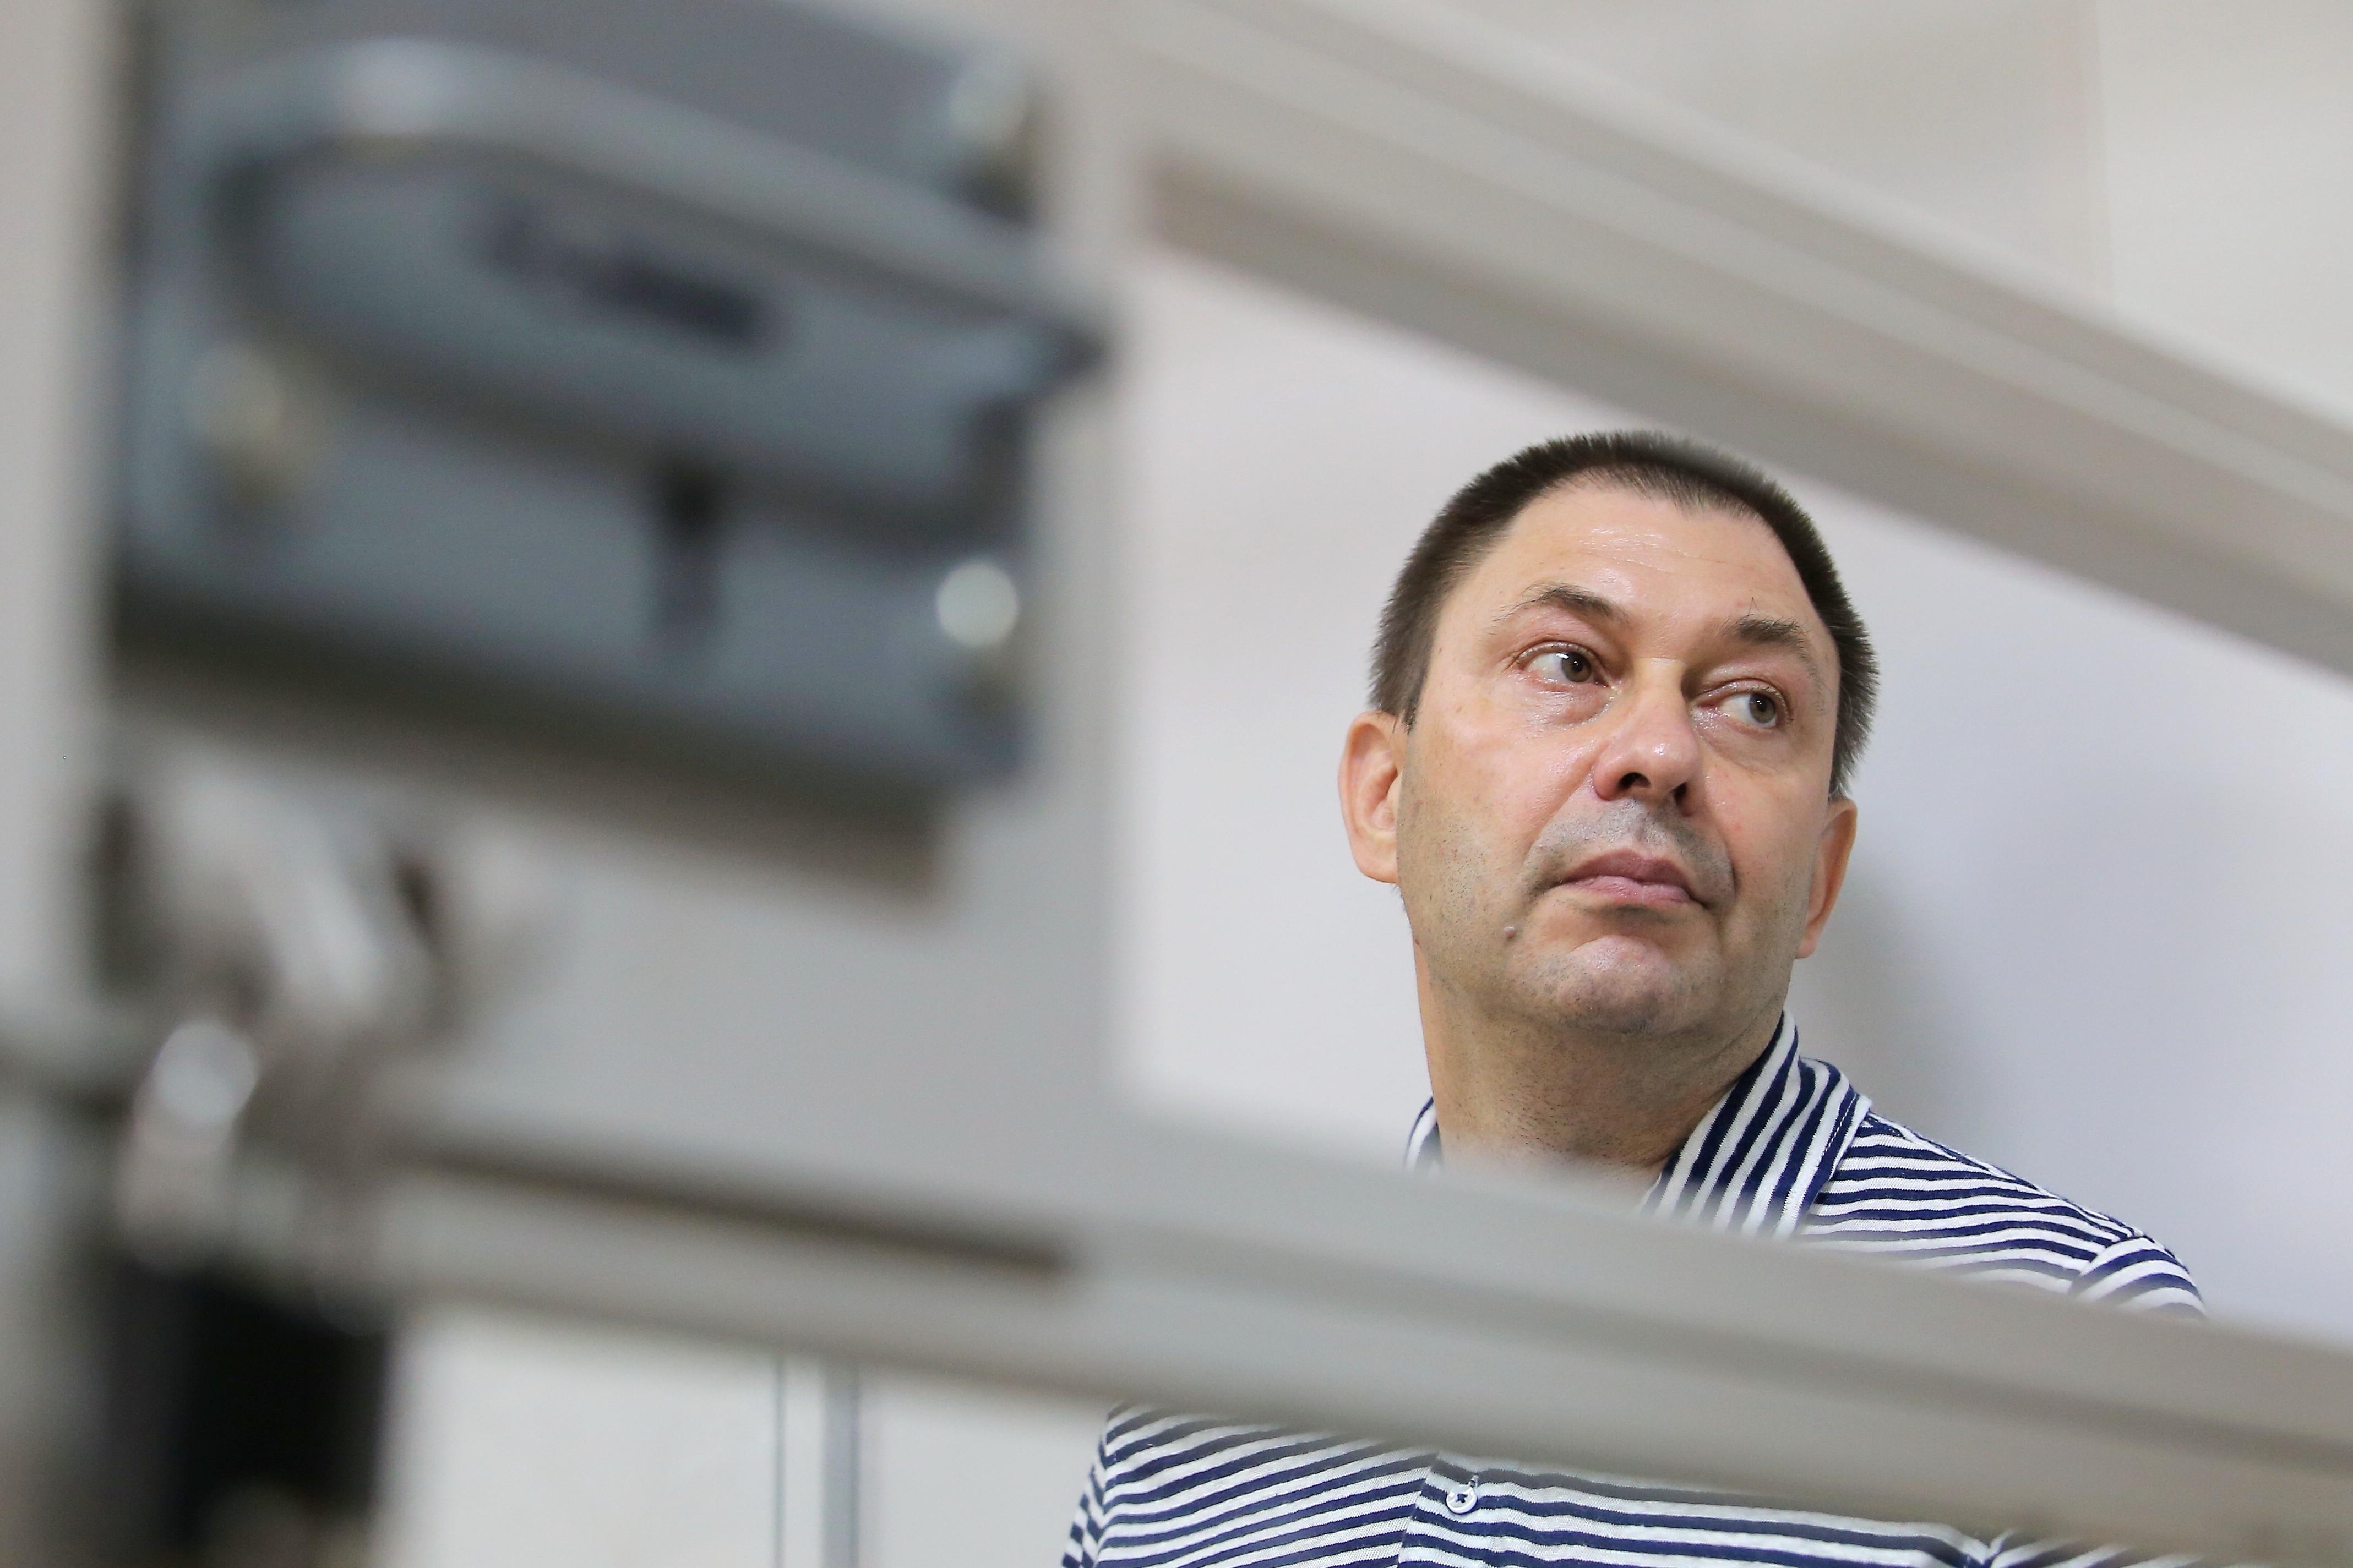 <p>Кирилл Вышинский. Фото: &copy;РИА Новости/Стрингер</p>